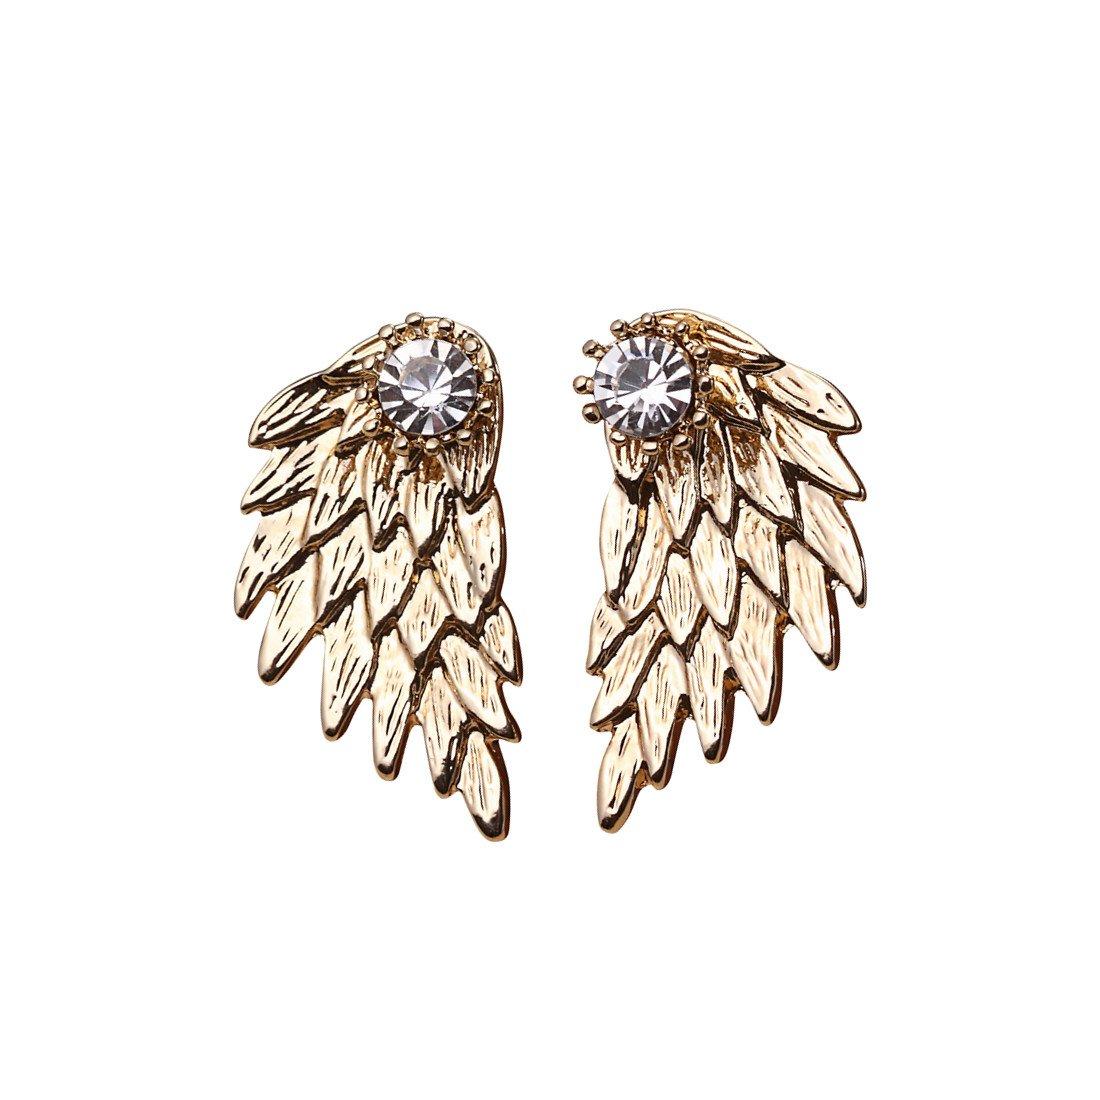 Cute Gothic Angel Wing Stud Earrings Ear Jacket for Women Unique Fashion MengPa Jewelry YH0419D